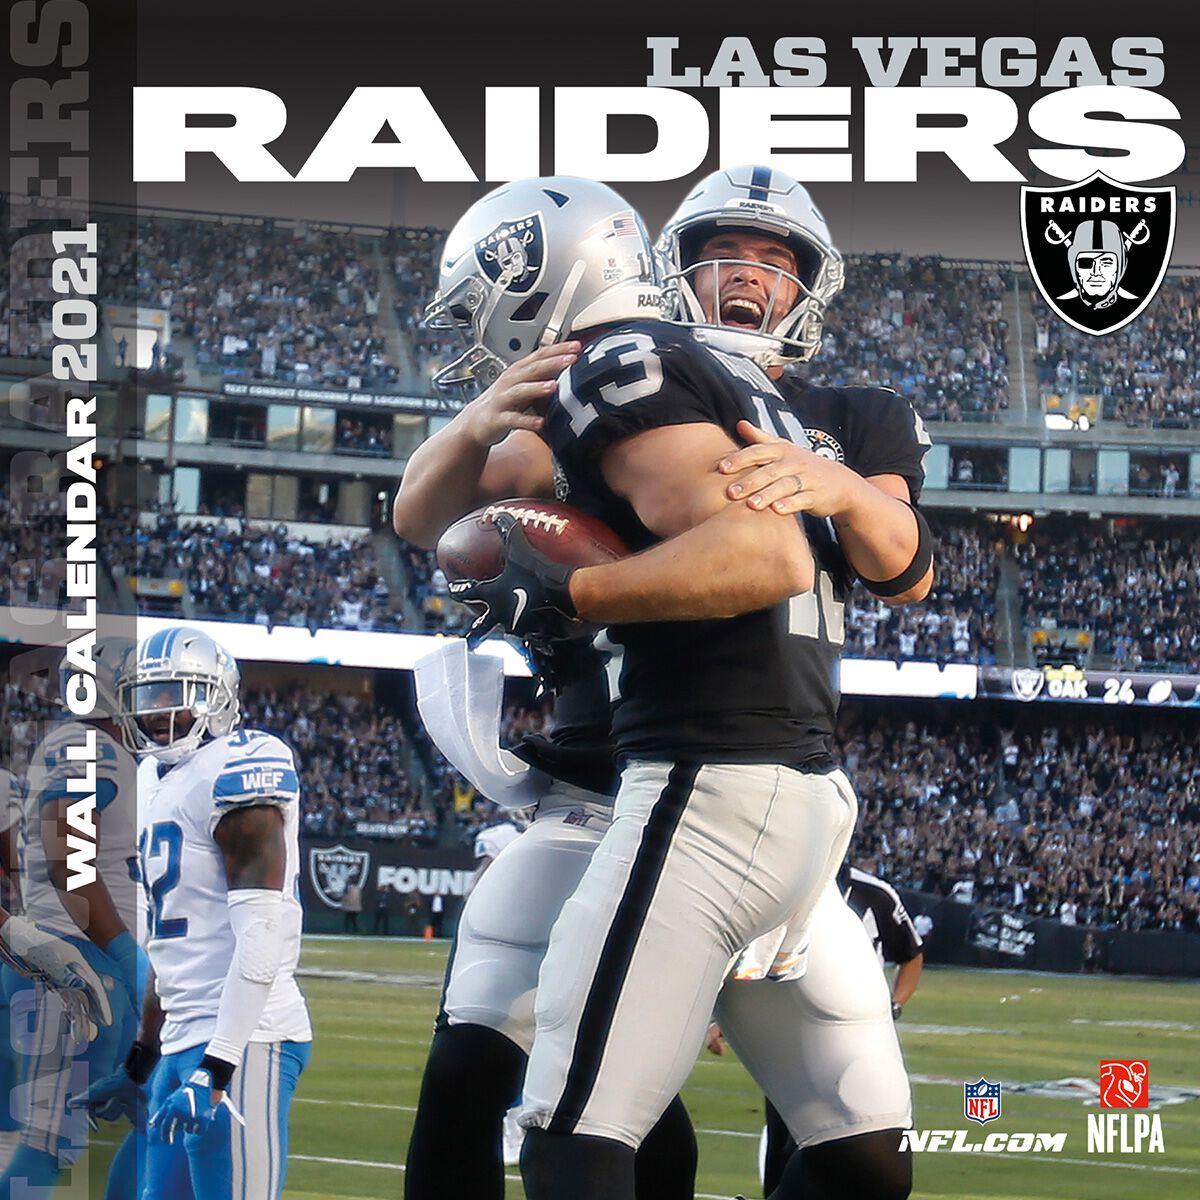 Las Vegas Raiders   Calendrier 2021 | NFL Calendrier mural | EMP